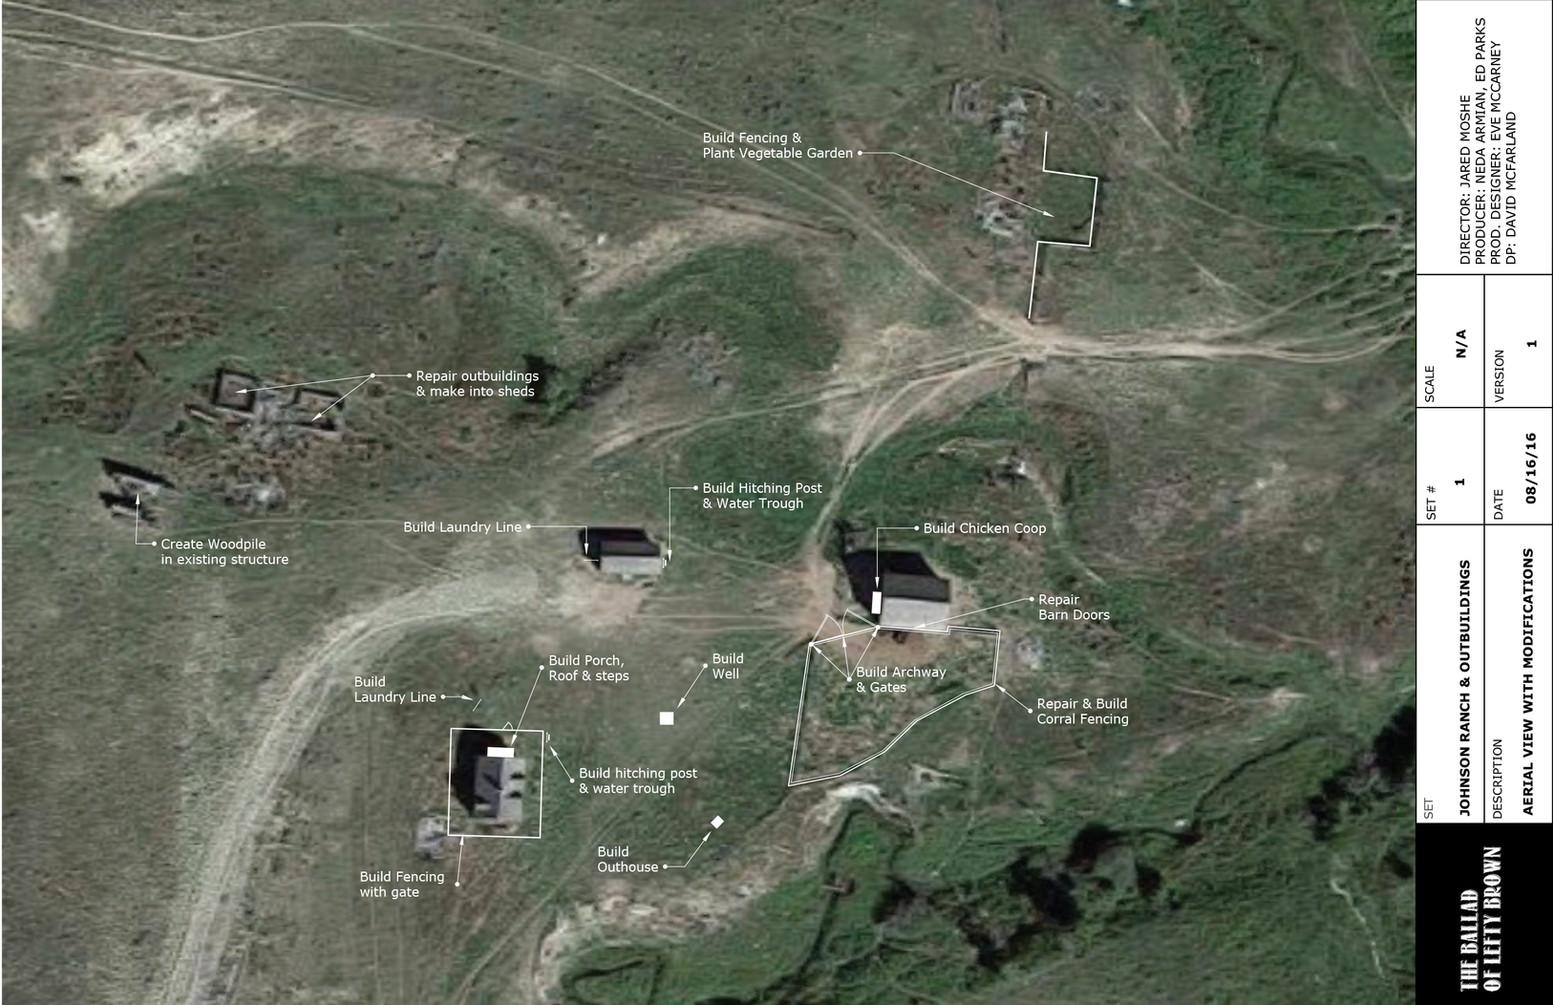 Ranch Aerial Plan & Notes